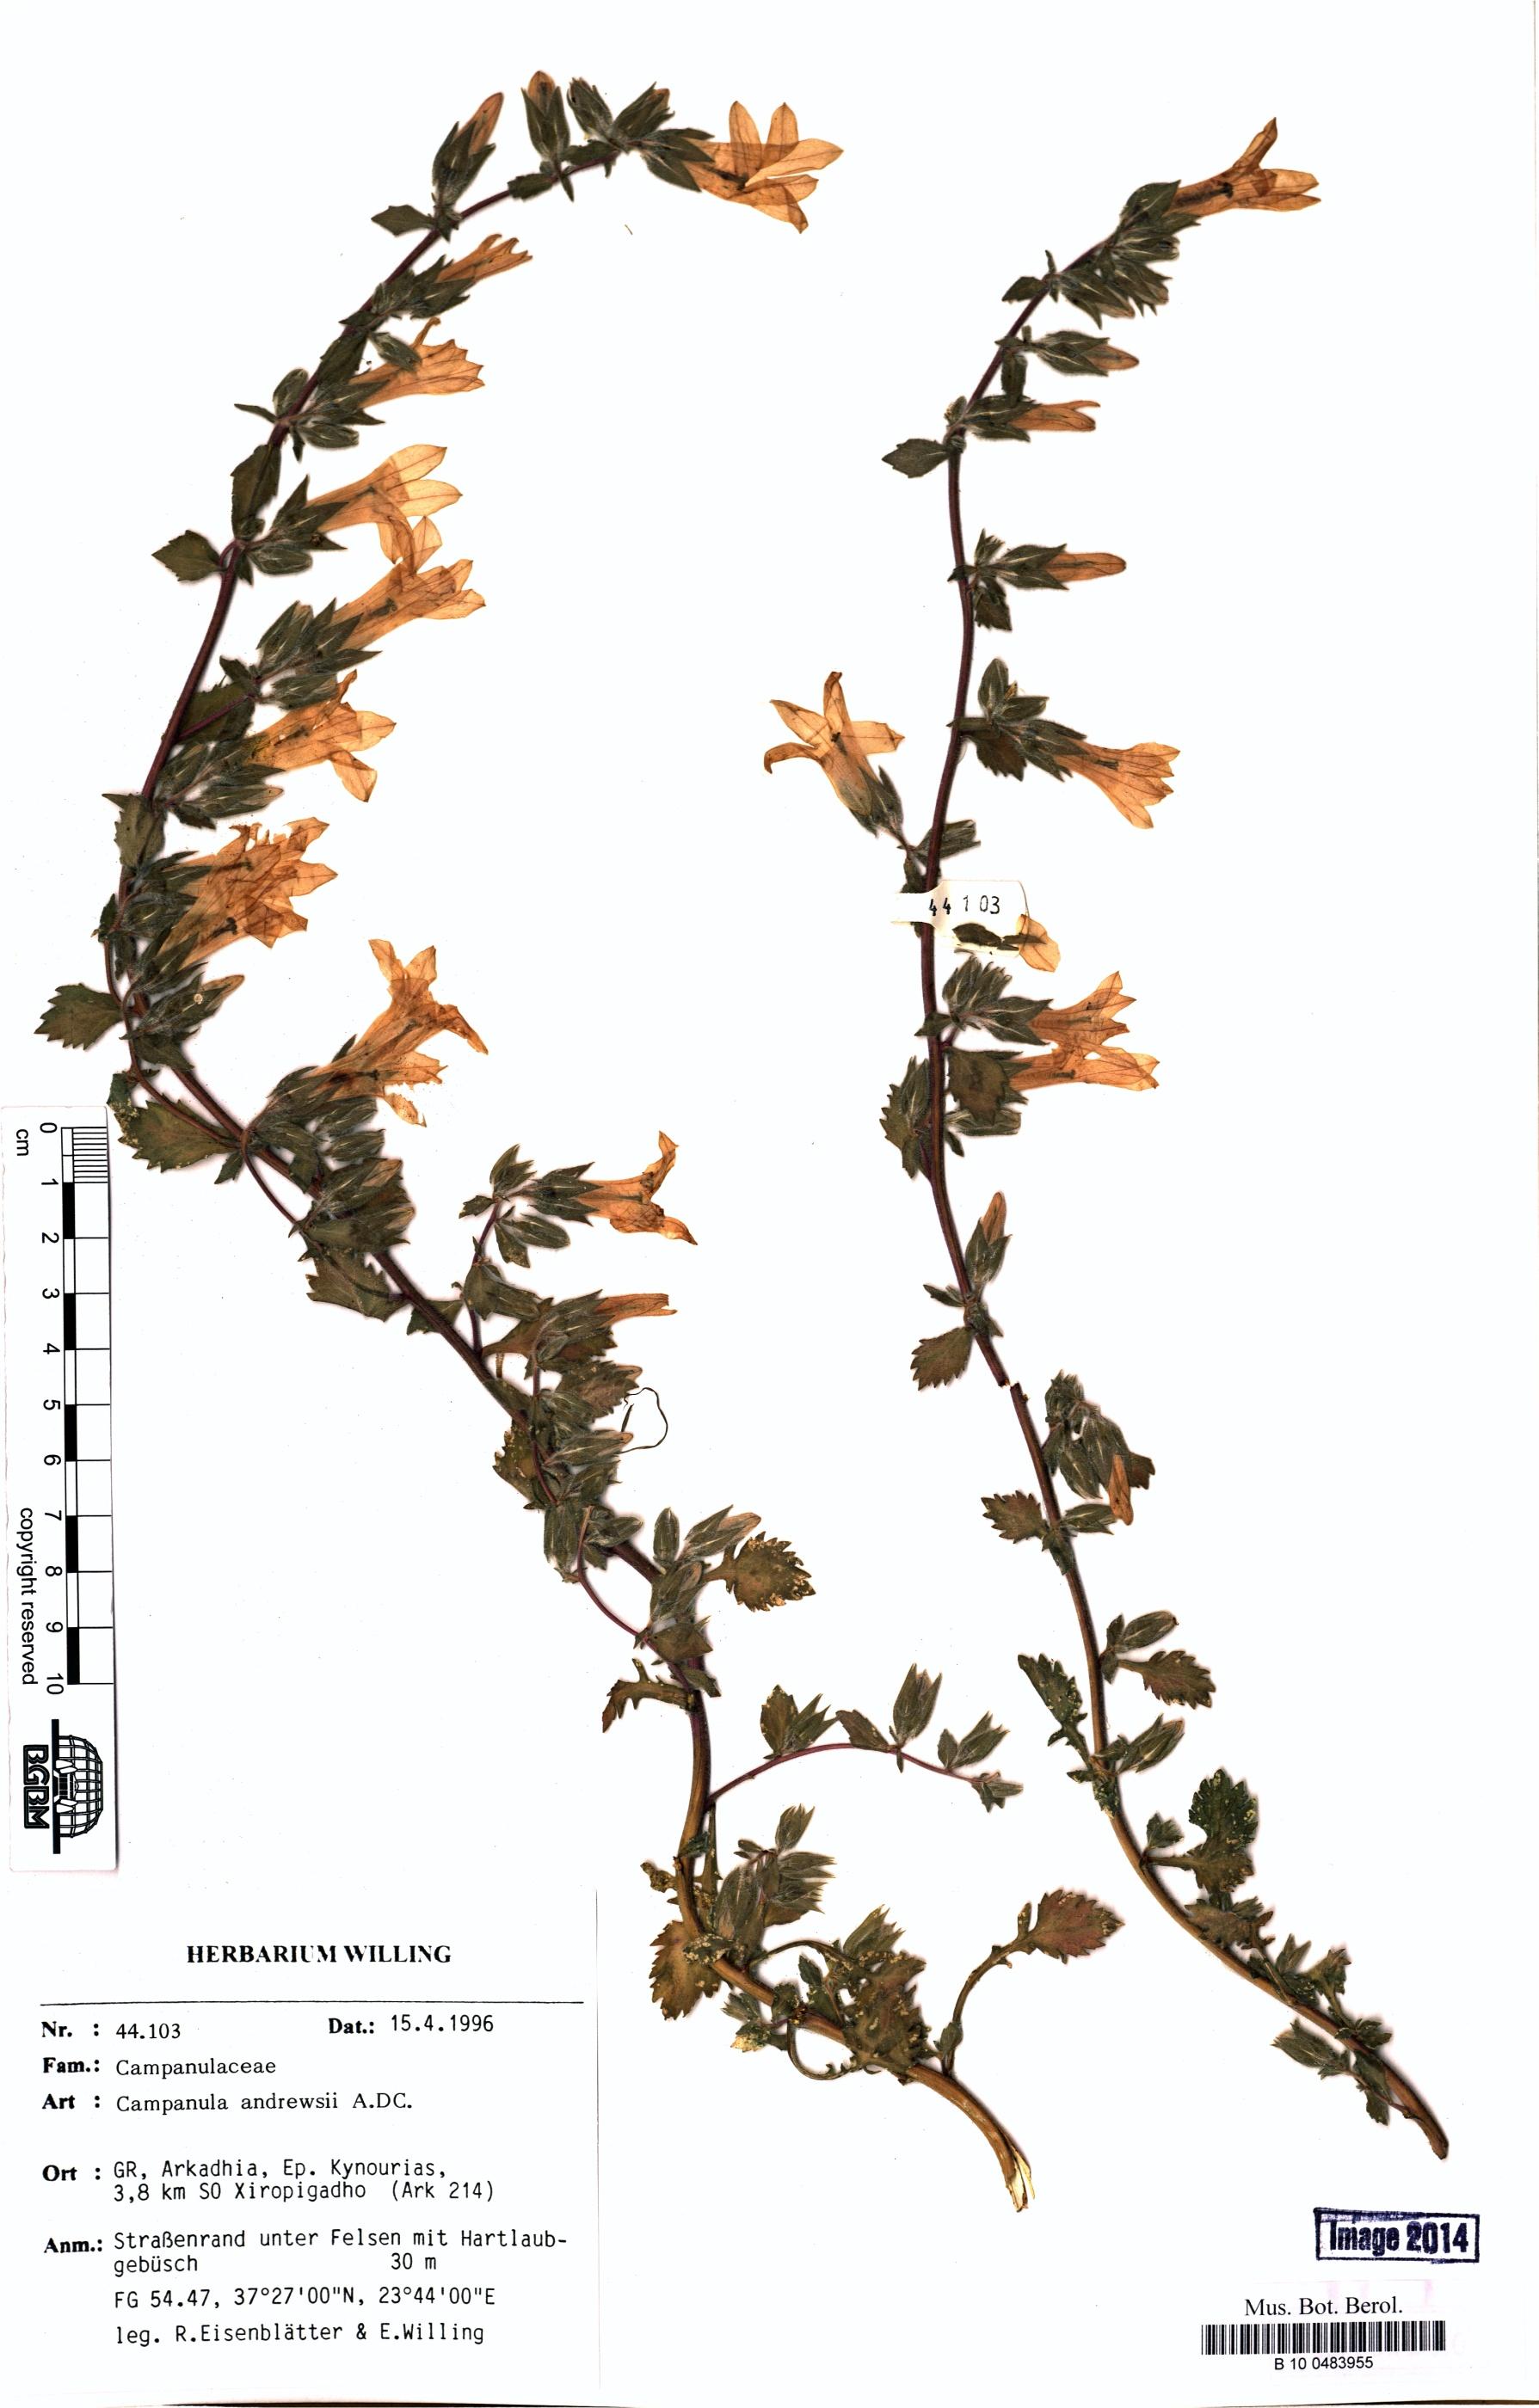 http://ww2.bgbm.org/herbarium/images/B/10/04/83/95/B_10_0483955.jpg